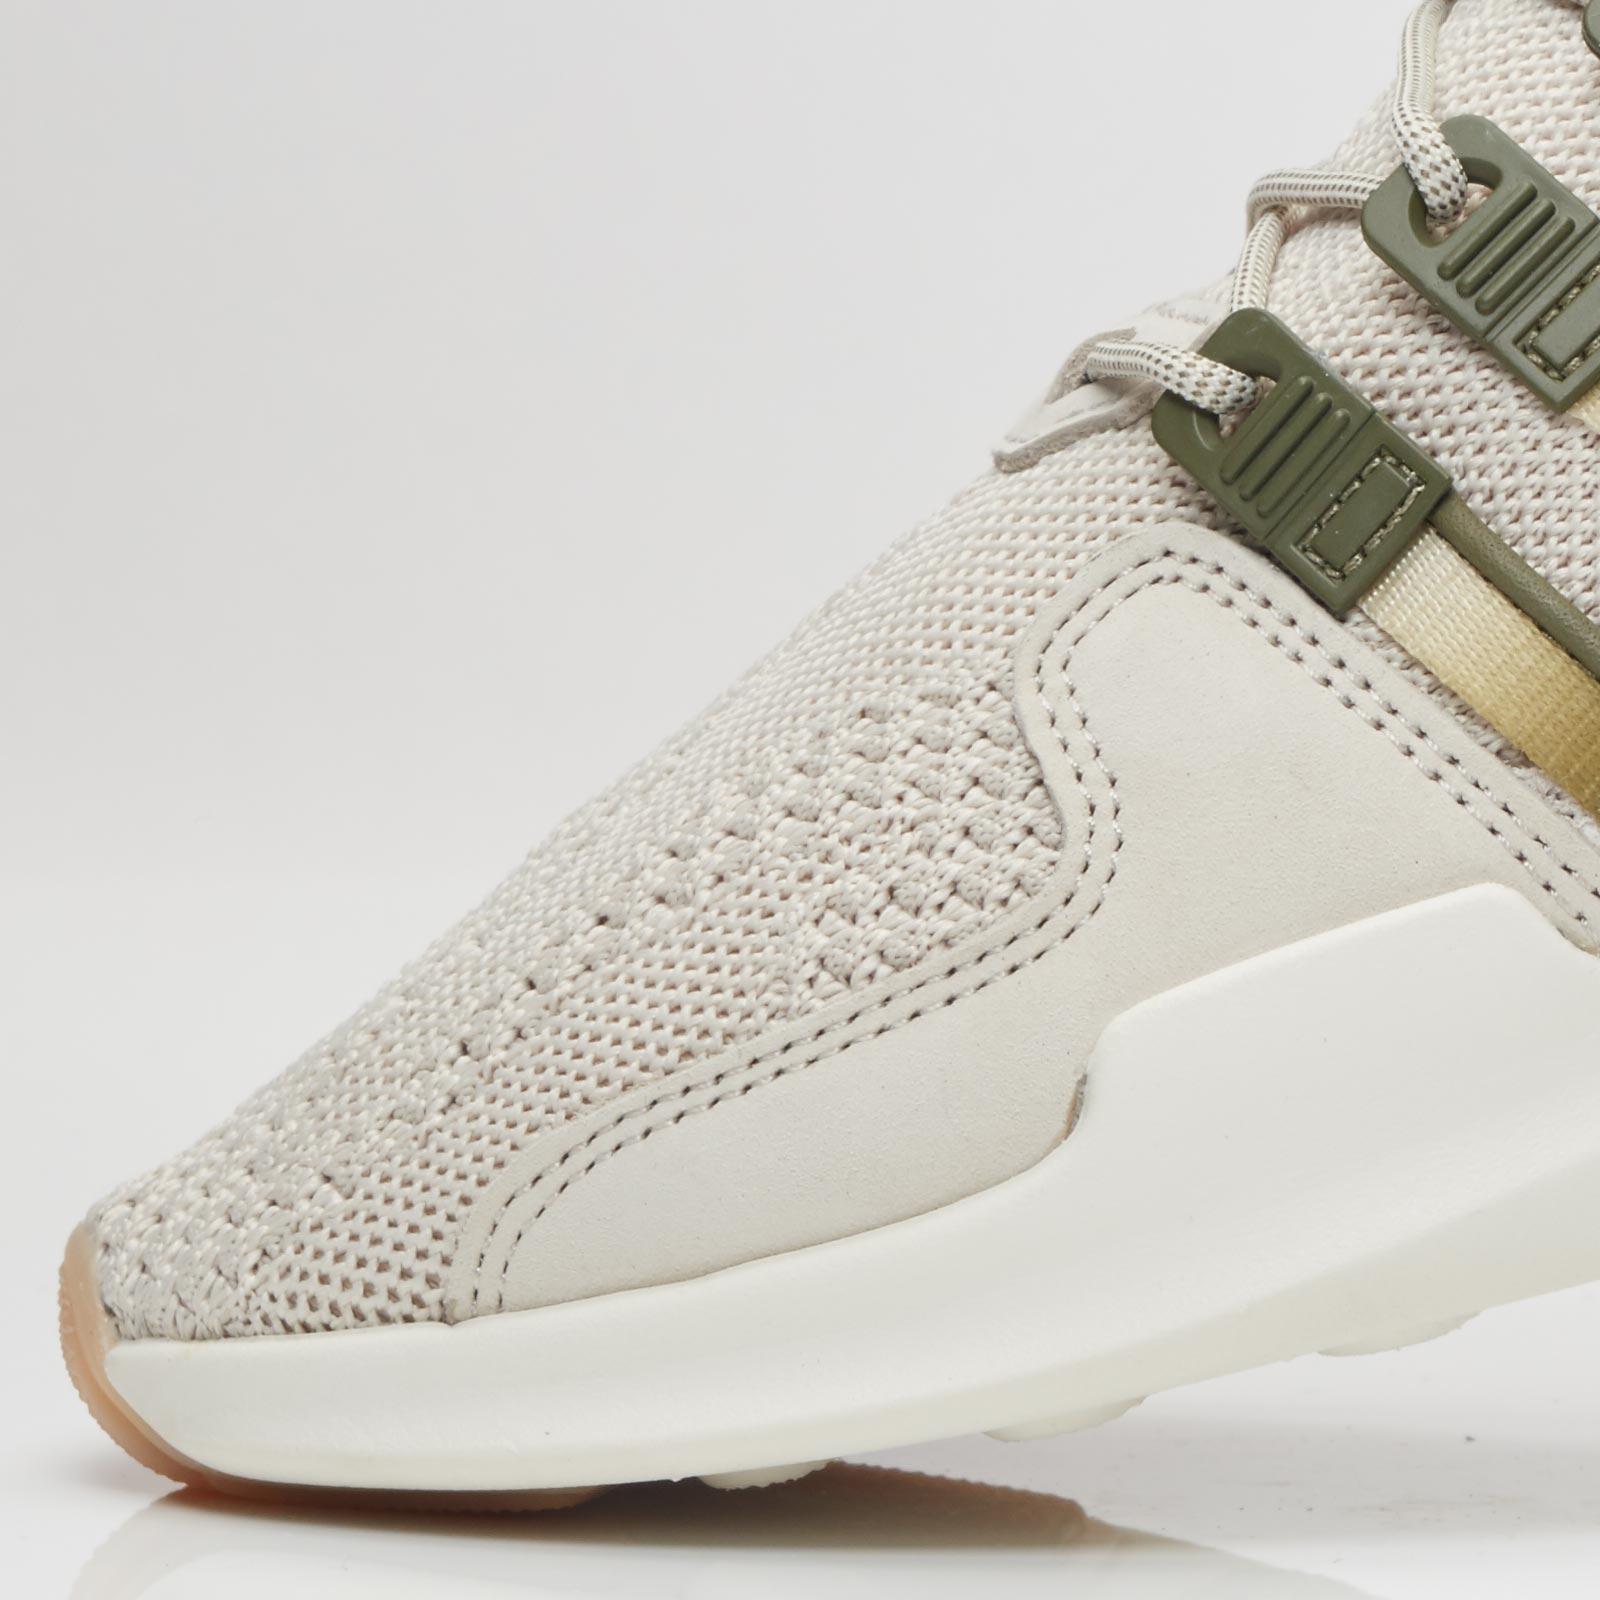 adidas eqt support adv herren sale